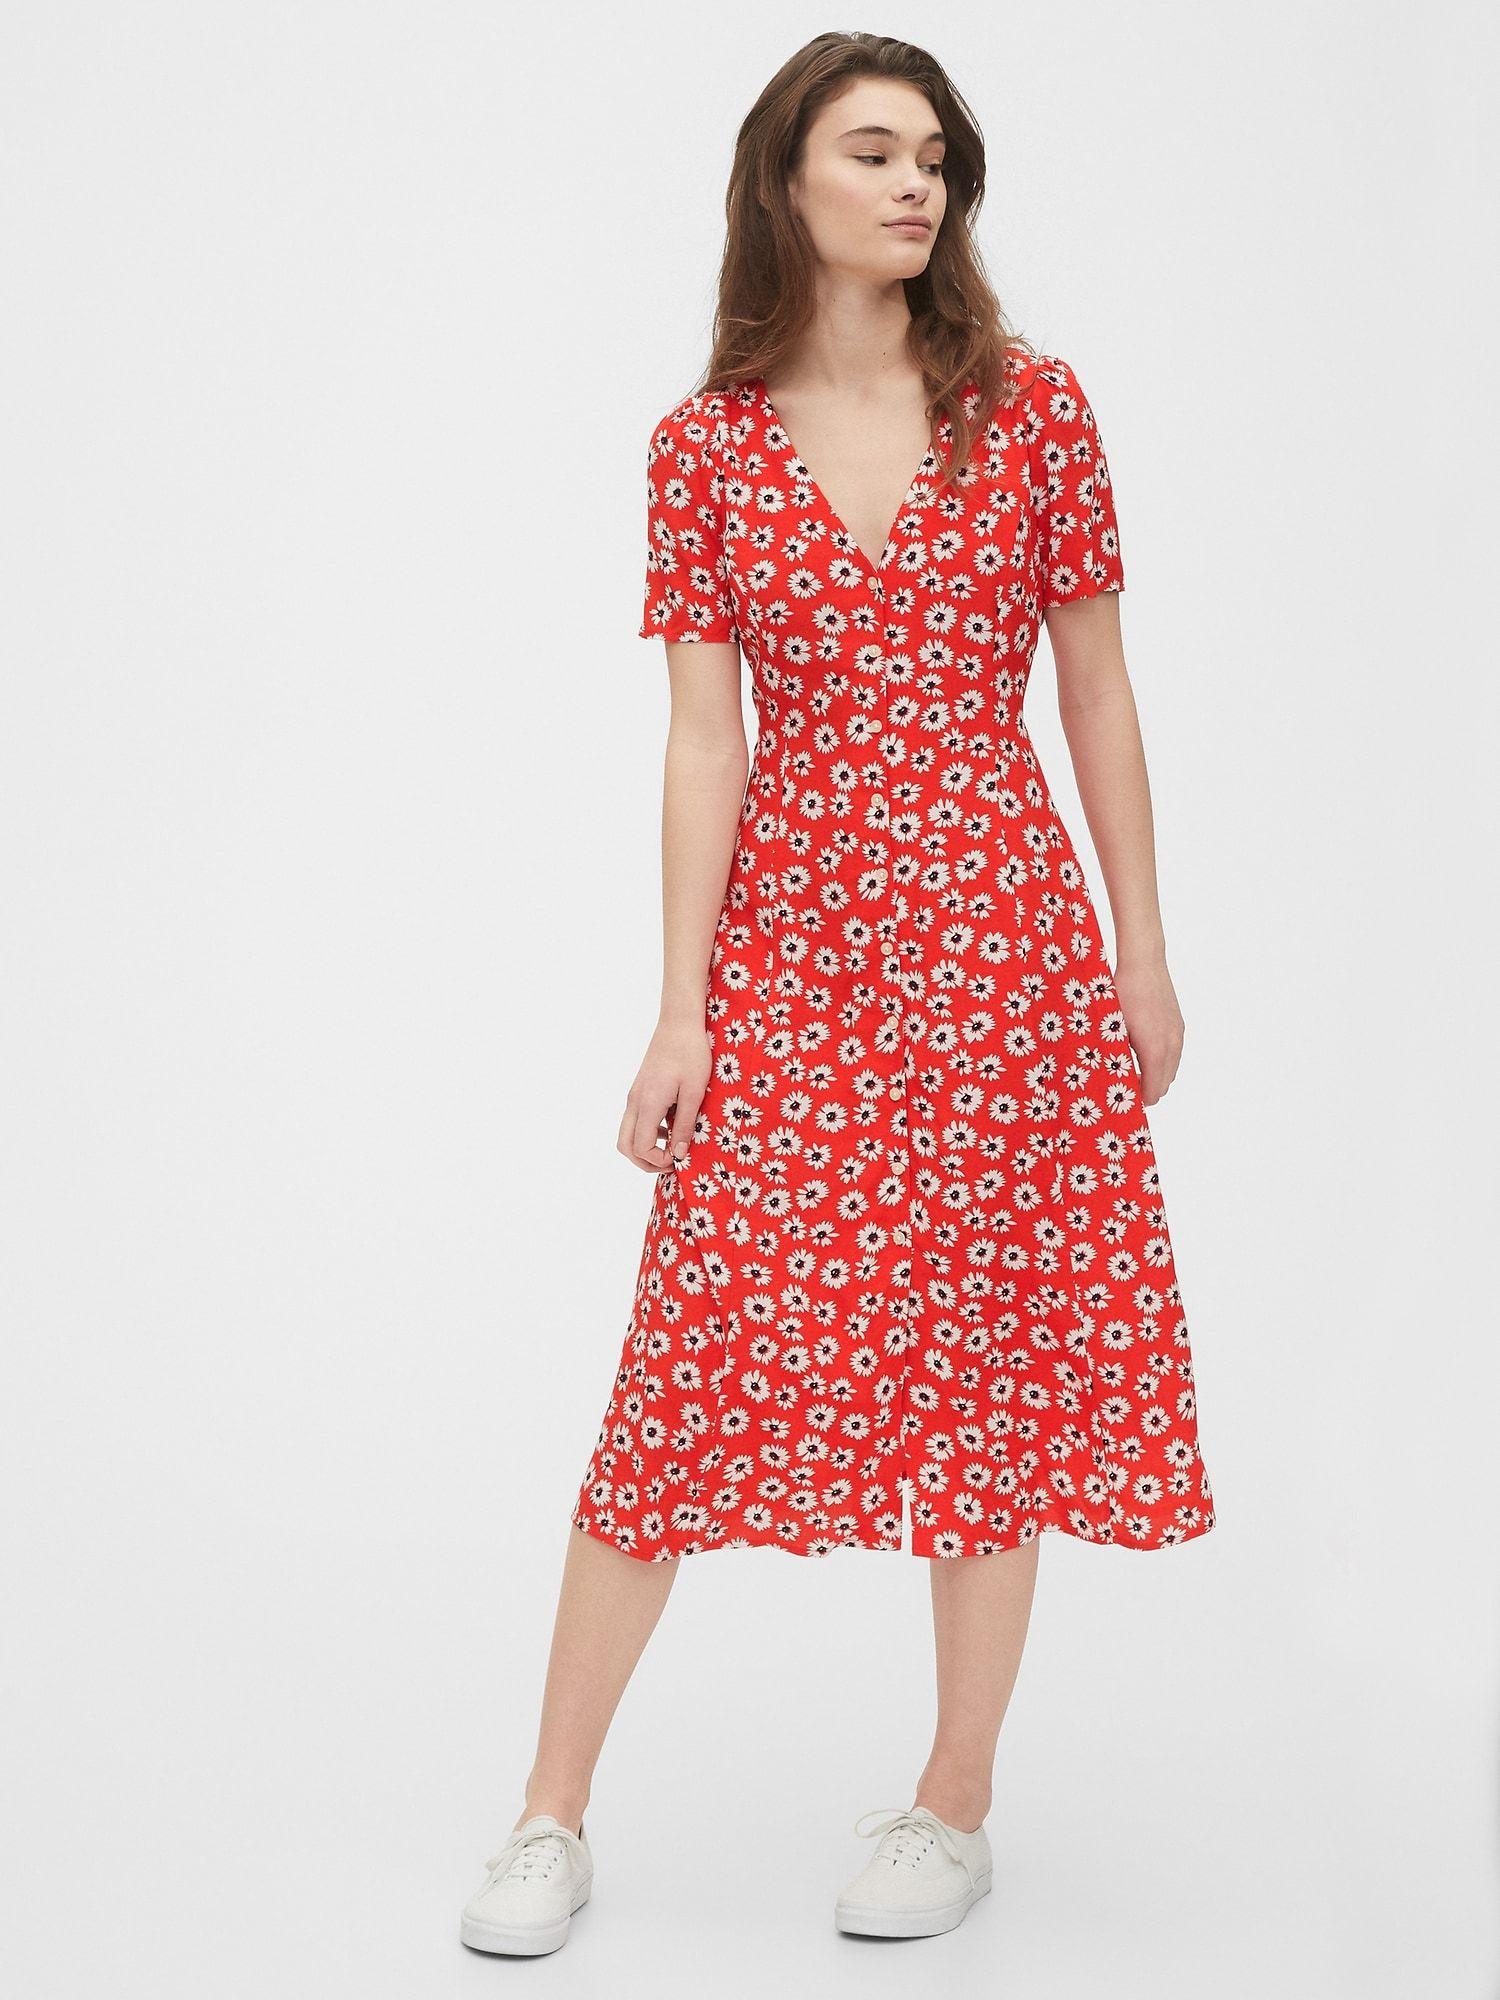 Gap Button Front Midi Dress Red Floral Print Midi Dress Casual Red Midi Dress Floral Dress Casual [ 2000 x 1500 Pixel ]